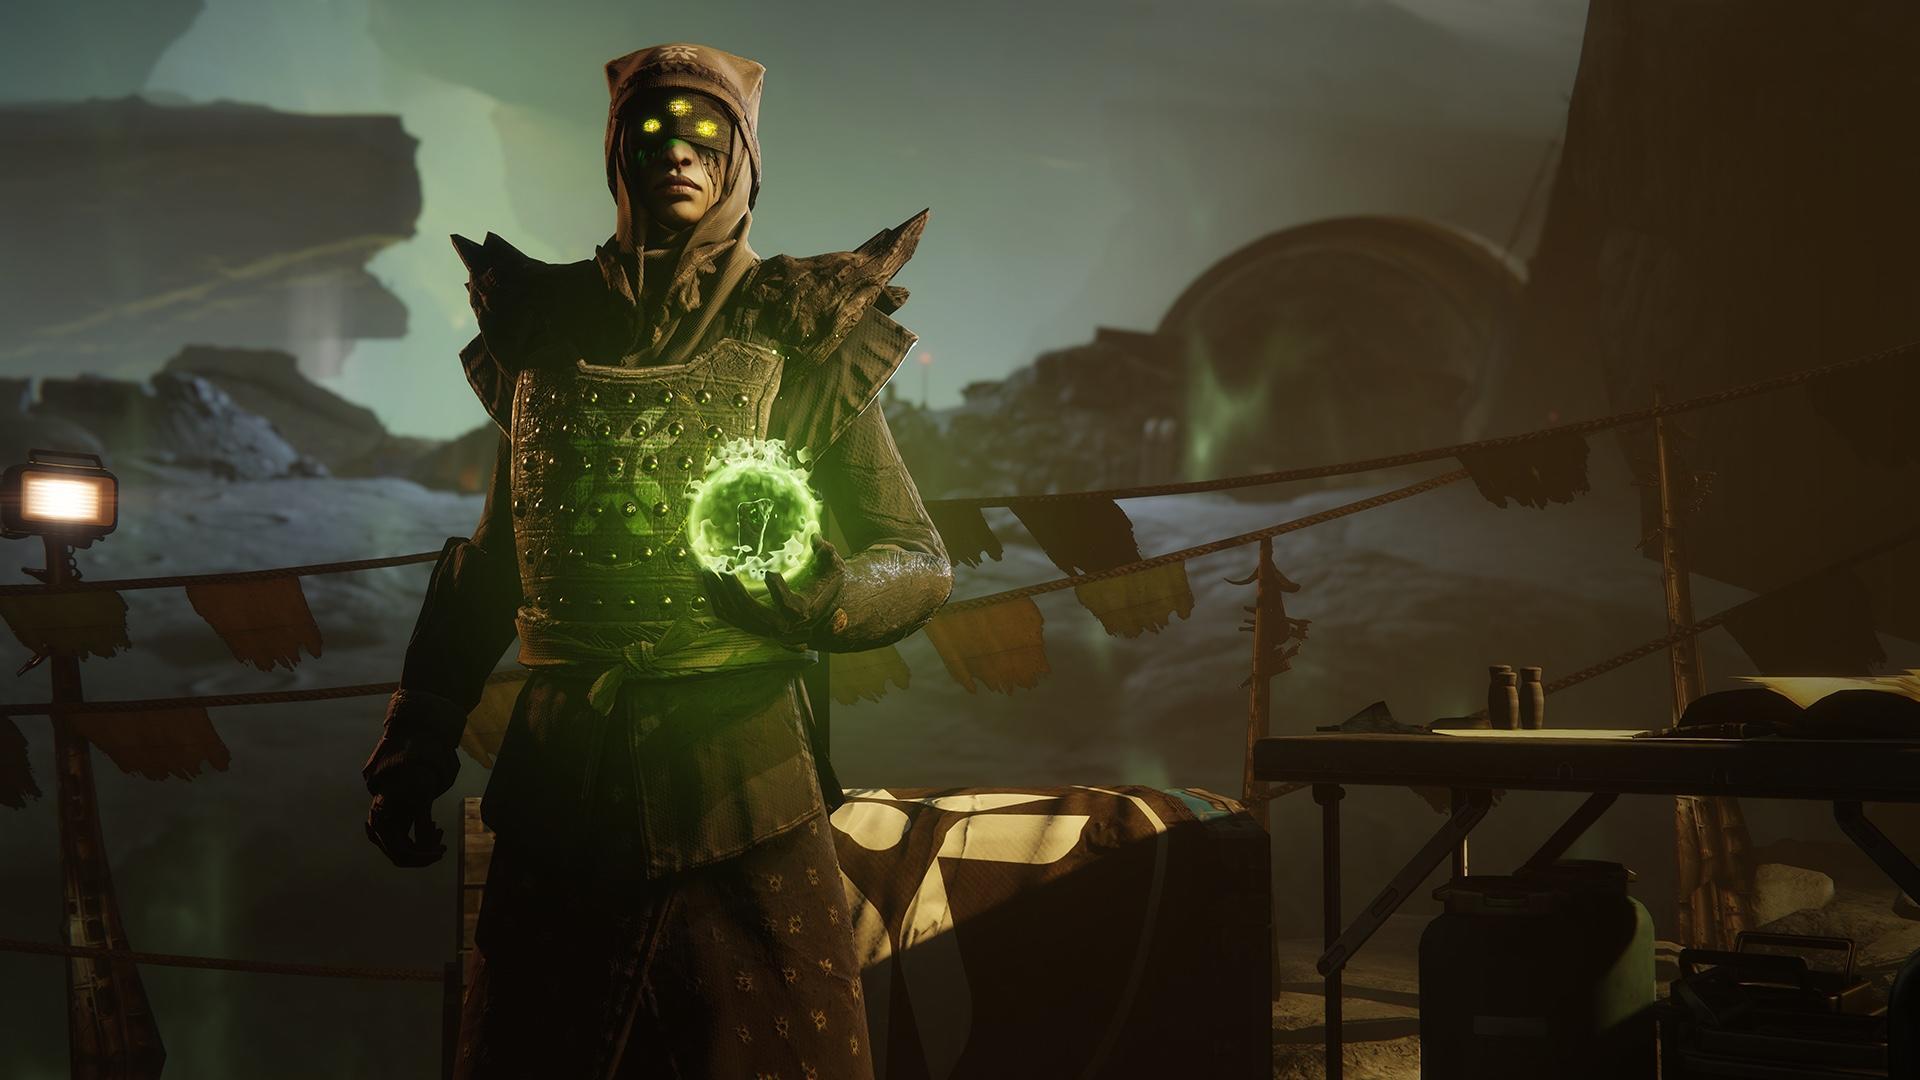 destiny 2 shadowkeep, pinnacle weapons, ritual weapons